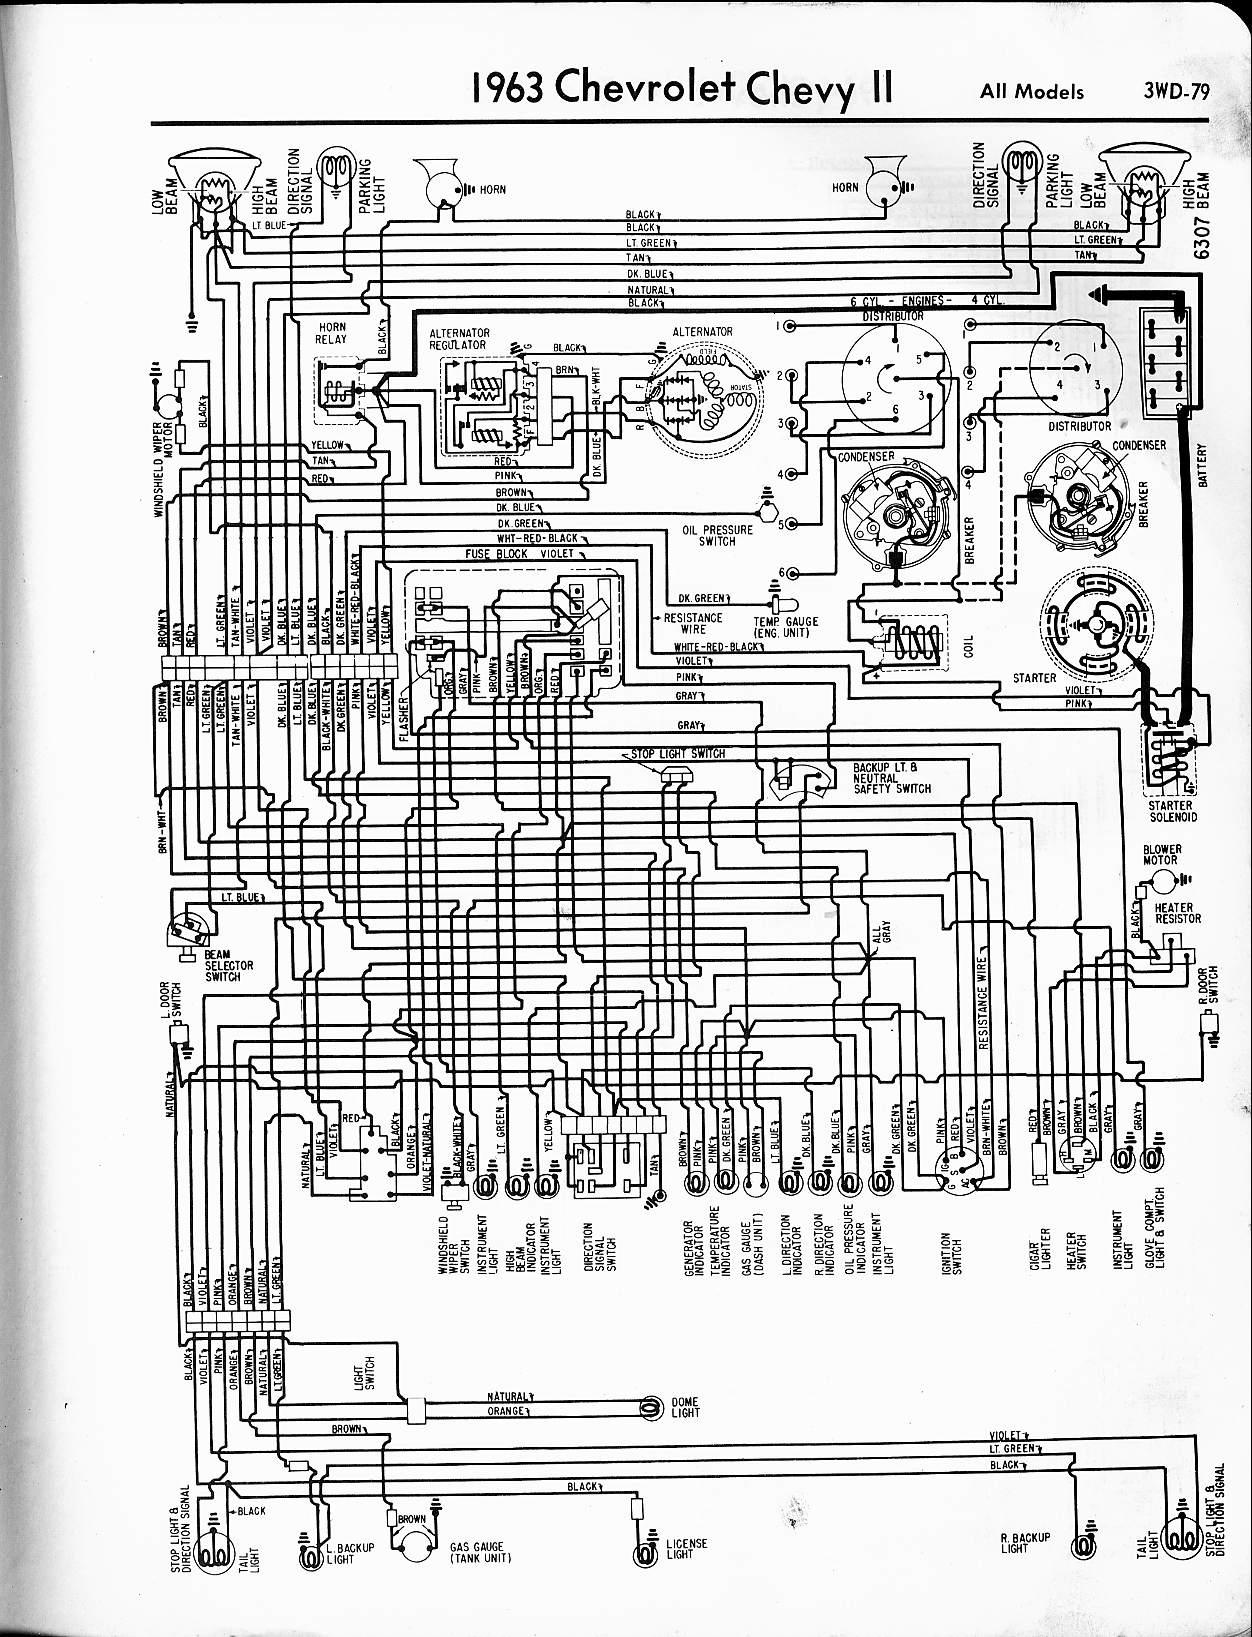 1965 chevy 2 headlight wiring - settings wiring diagram leak-tabs -  leak-tabs.syrhortaleza.es  syrhortaleza.es